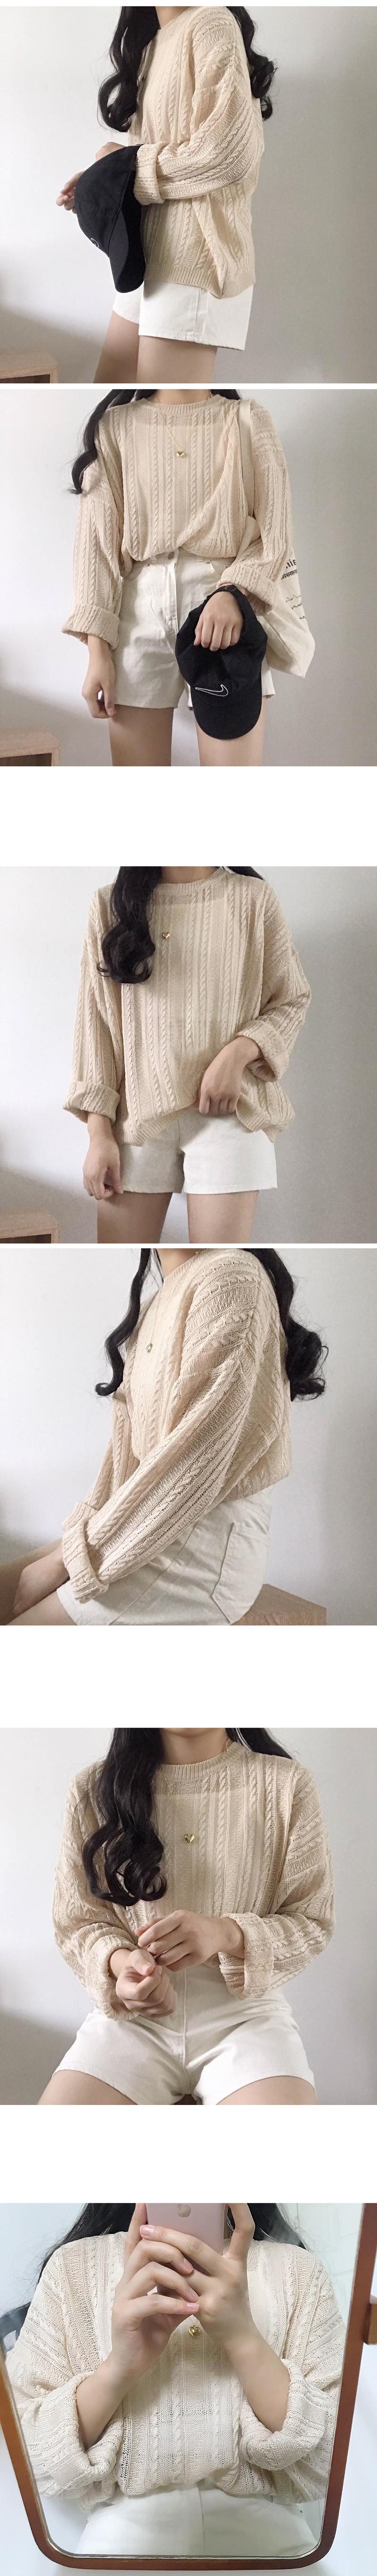 Twisted Rouge Knitwear